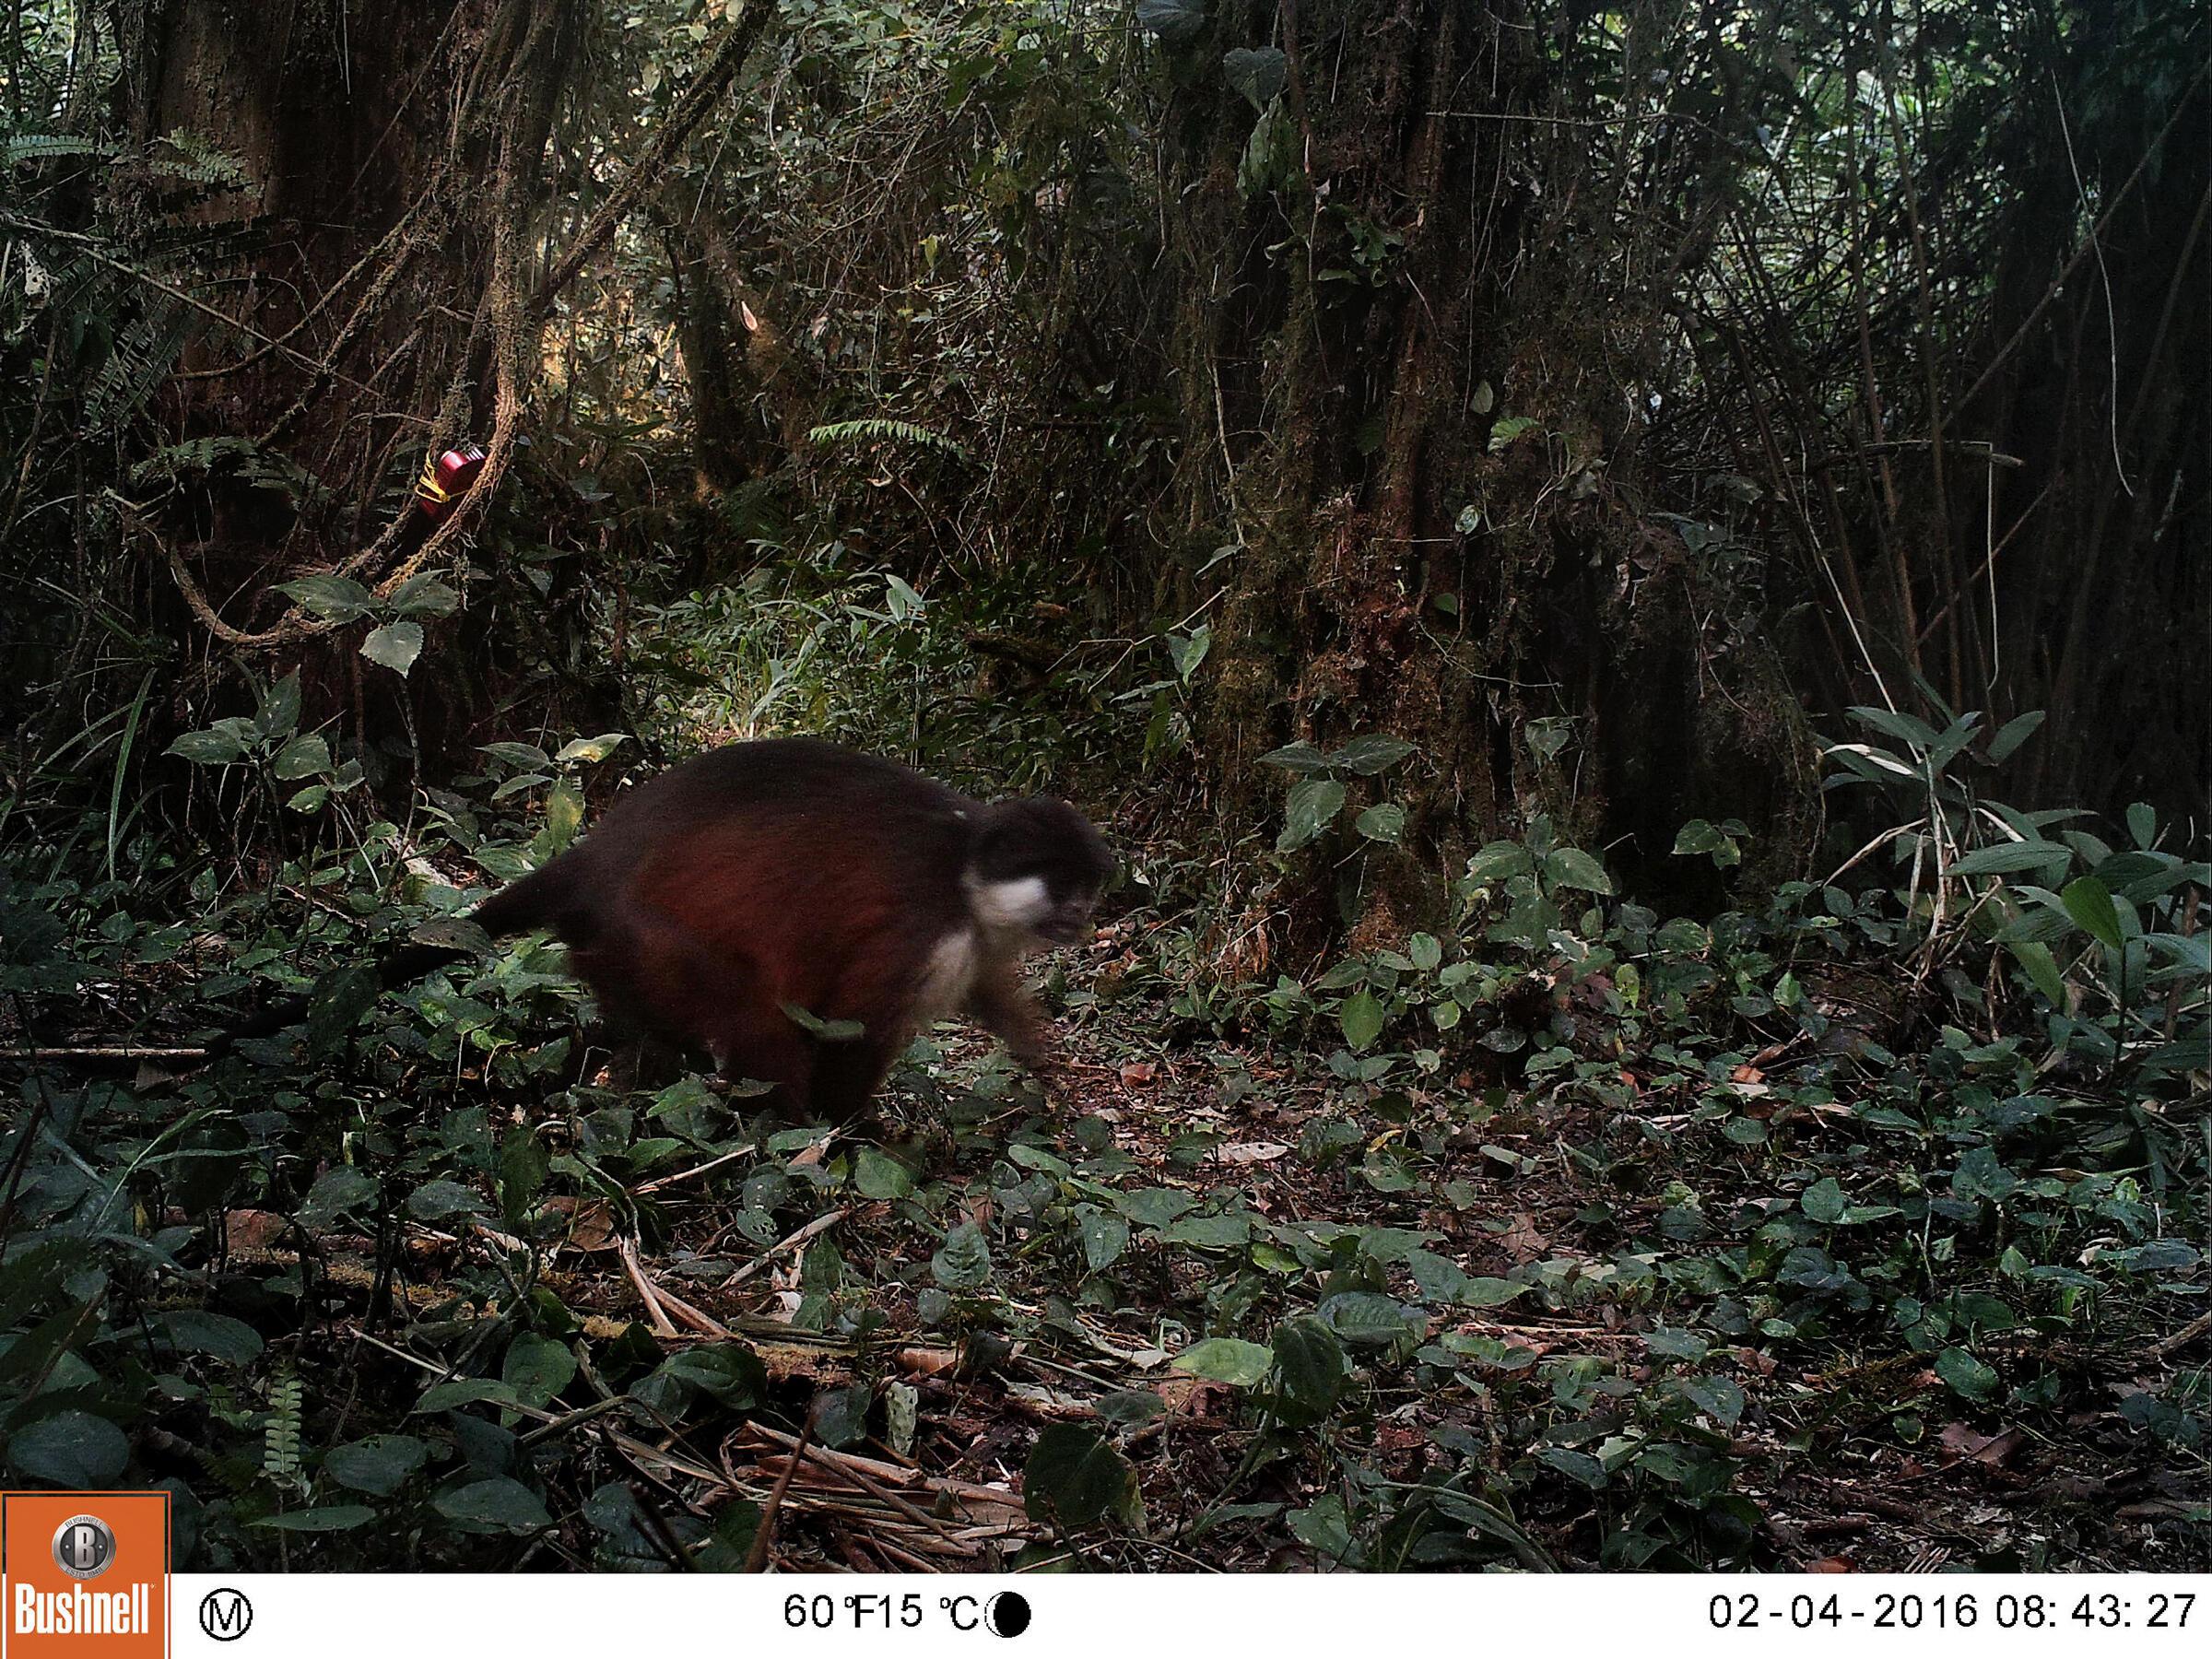 An endangered Pennant's red colobus. Kristin Brzeski